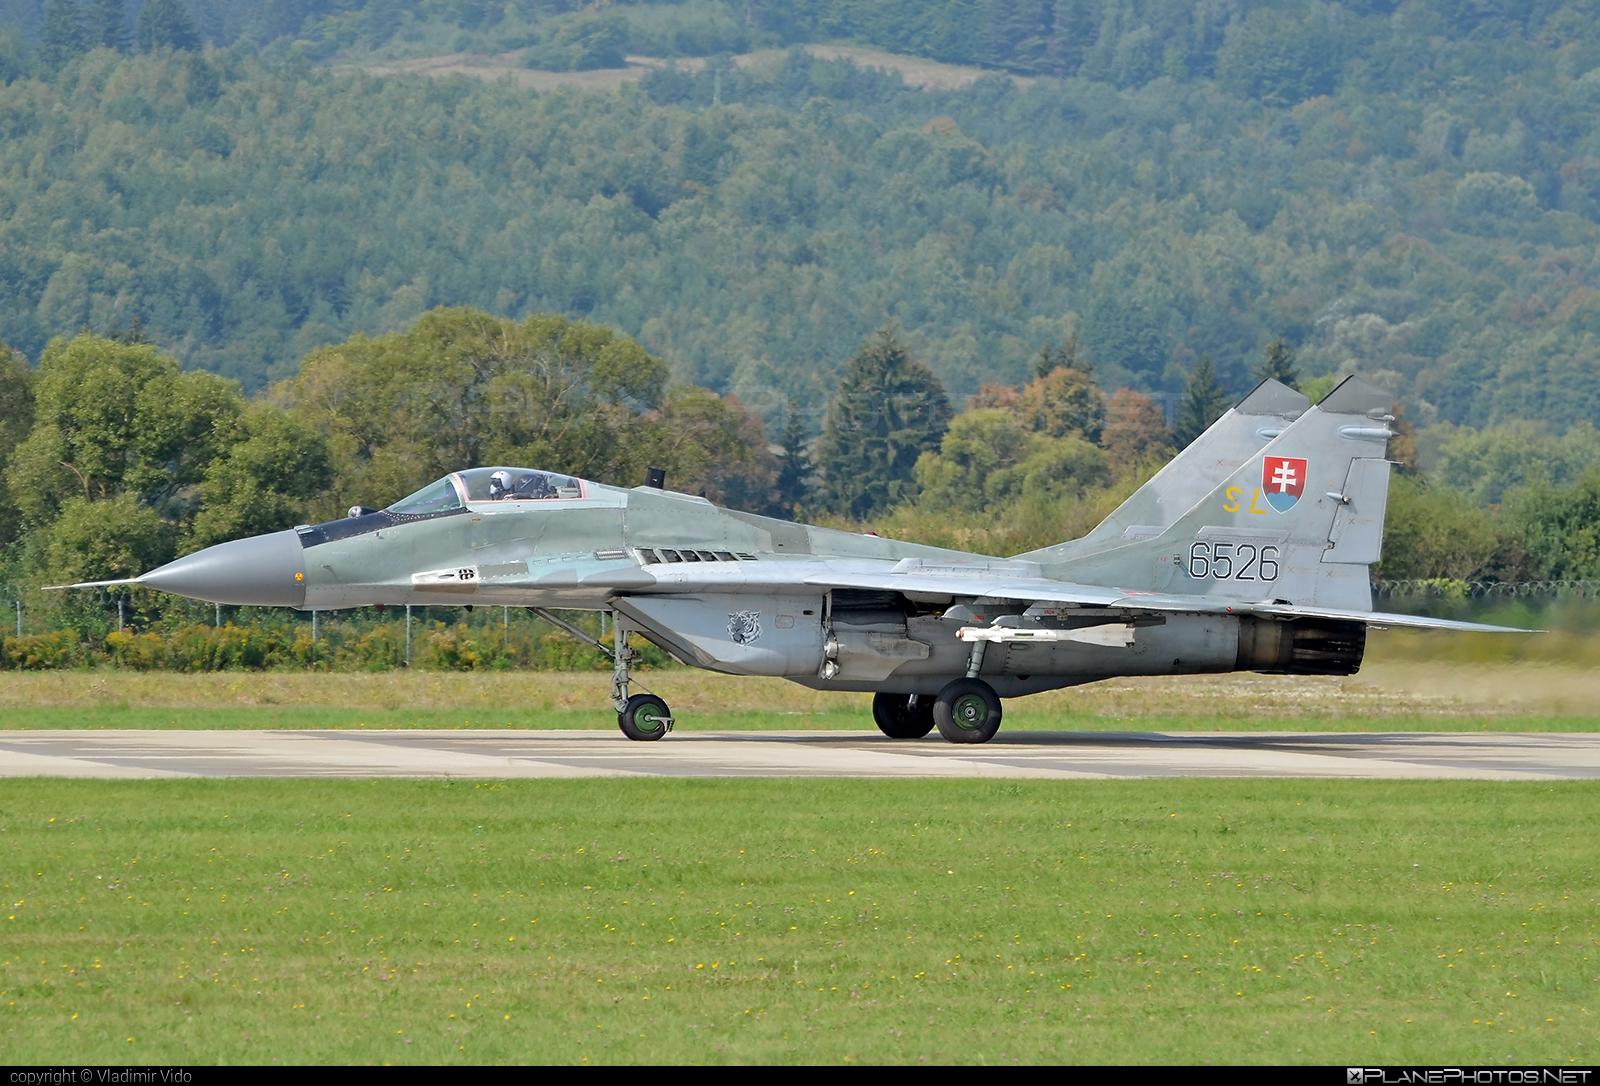 Mikoyan-Gurevich MiG-29AS - 6526 operated by Vzdušné sily OS SR (Slovak Air Force) #mig #mig29 #mig29as #mikoyangurevich #slovakairforce #vzdusnesilyossr